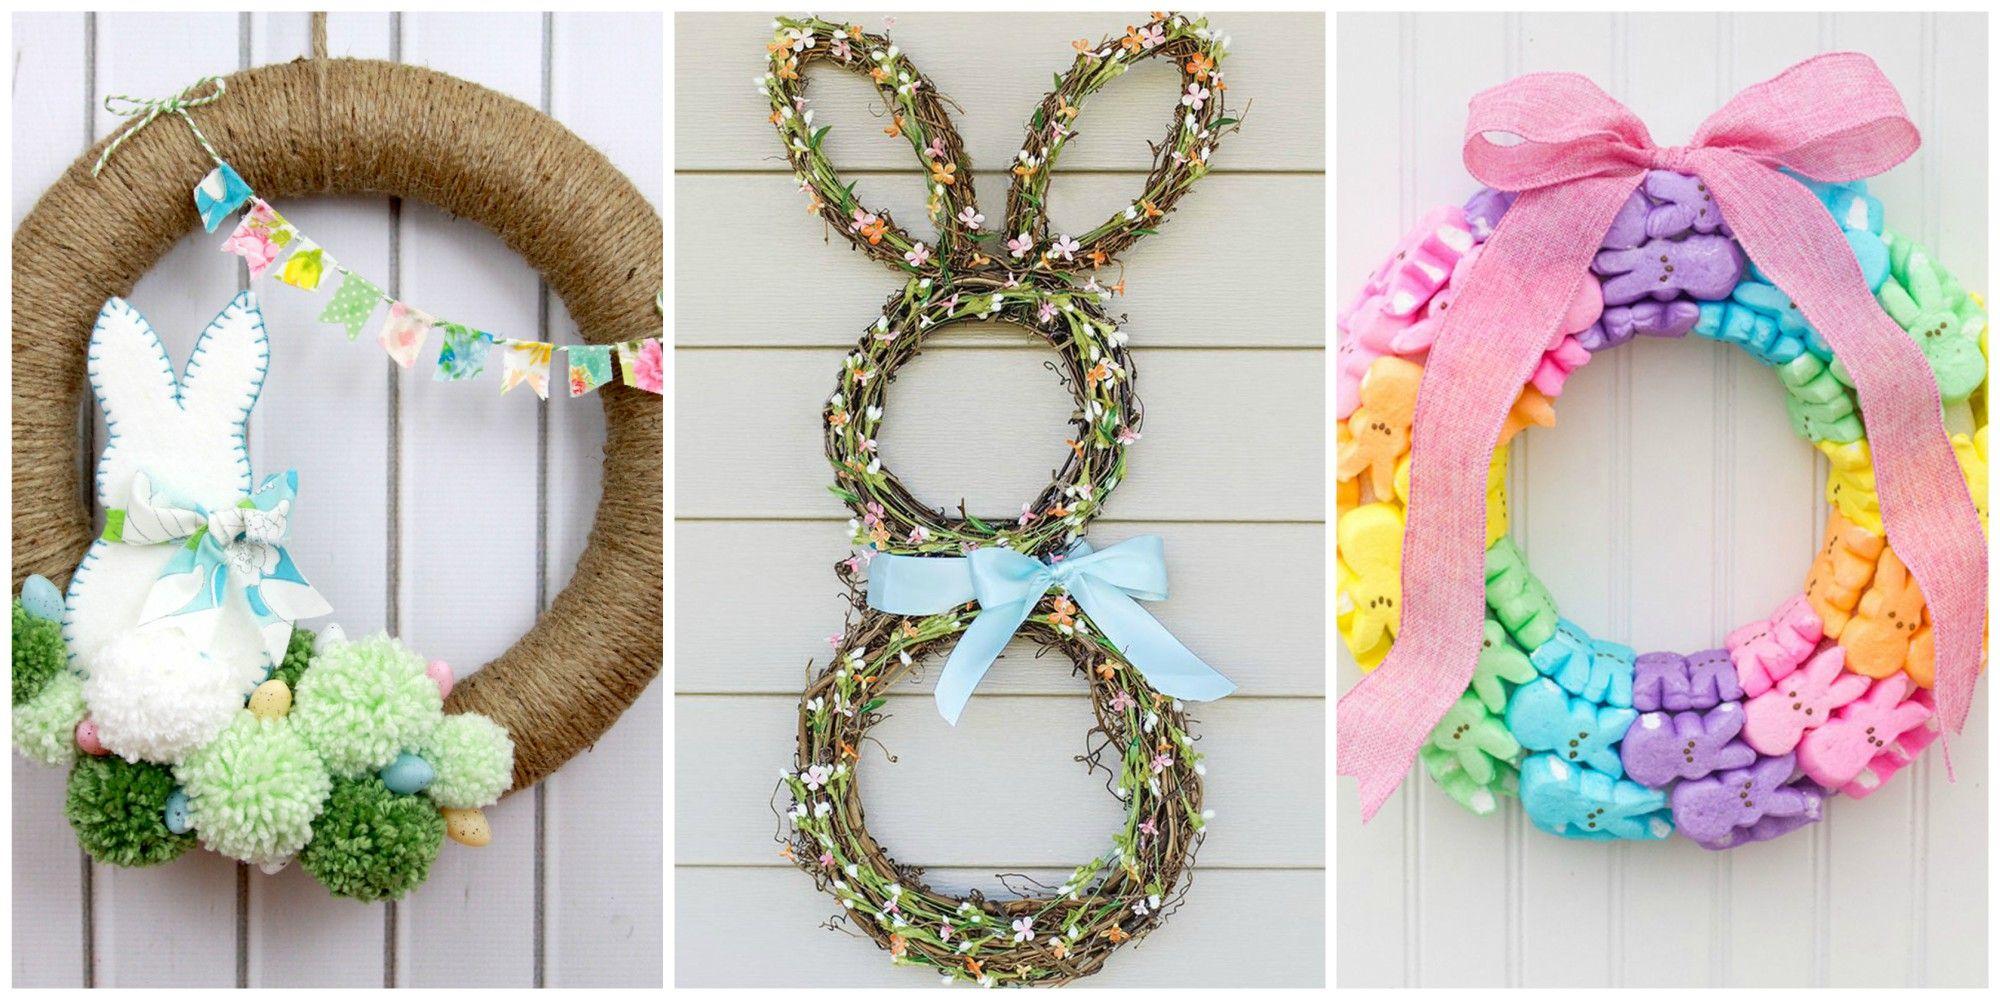 diy easter wreaths. \u0027  sc 1 st  Woman\u0027s Day & 14 DIY Easter Wreaths to Make This Spring - Homemade Easter Door ...